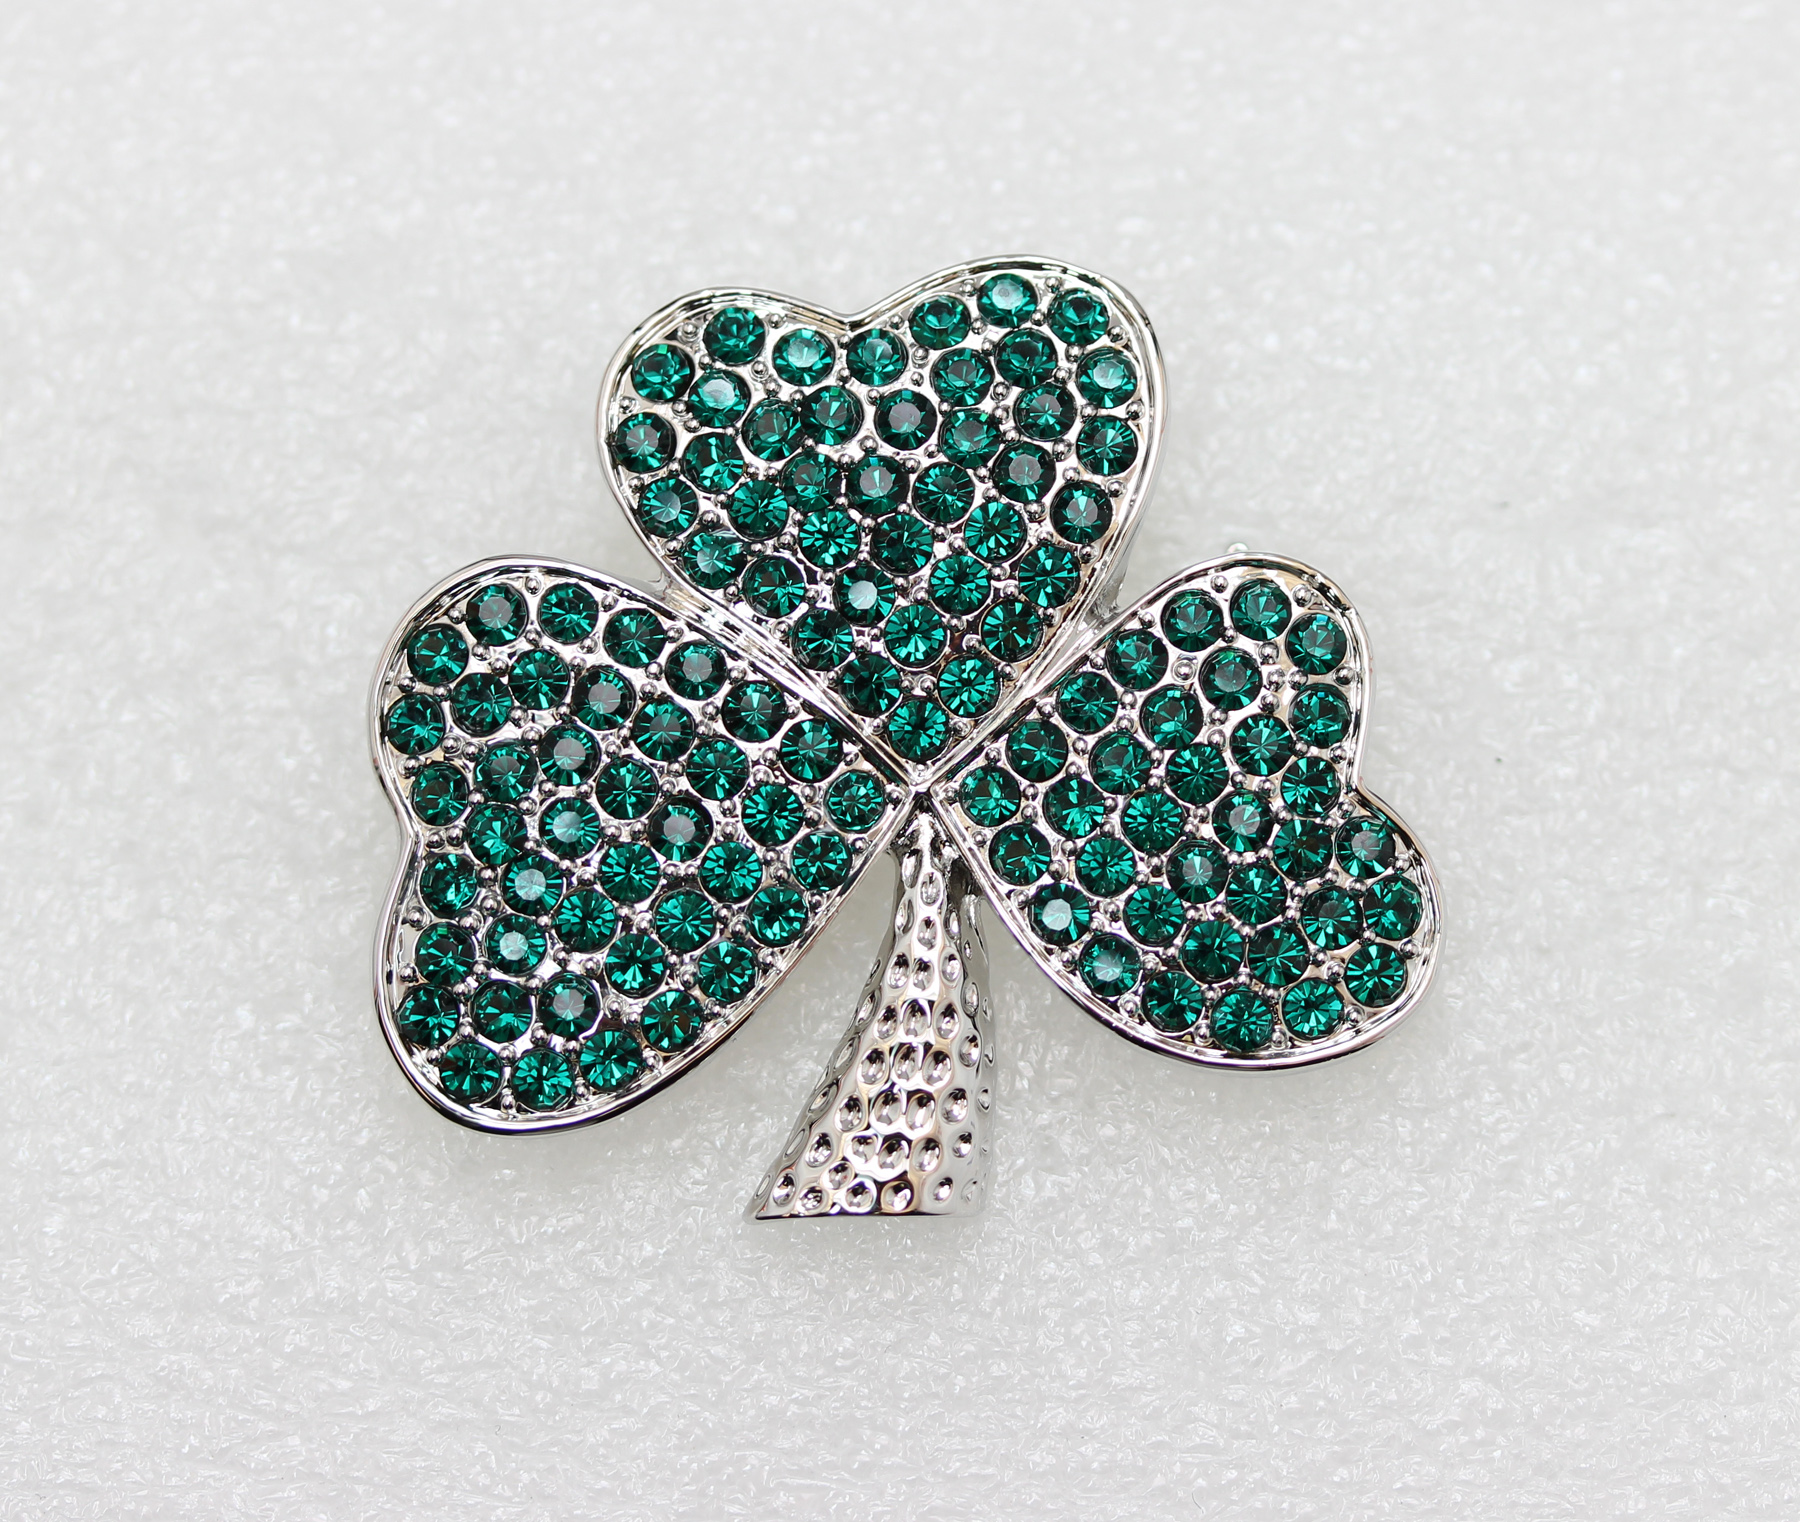 Emerald-Color-Green-Crystal-Shamrock-Clover-Leaf-Pin-Brooch-St-Patricks-Day thumbnail 9